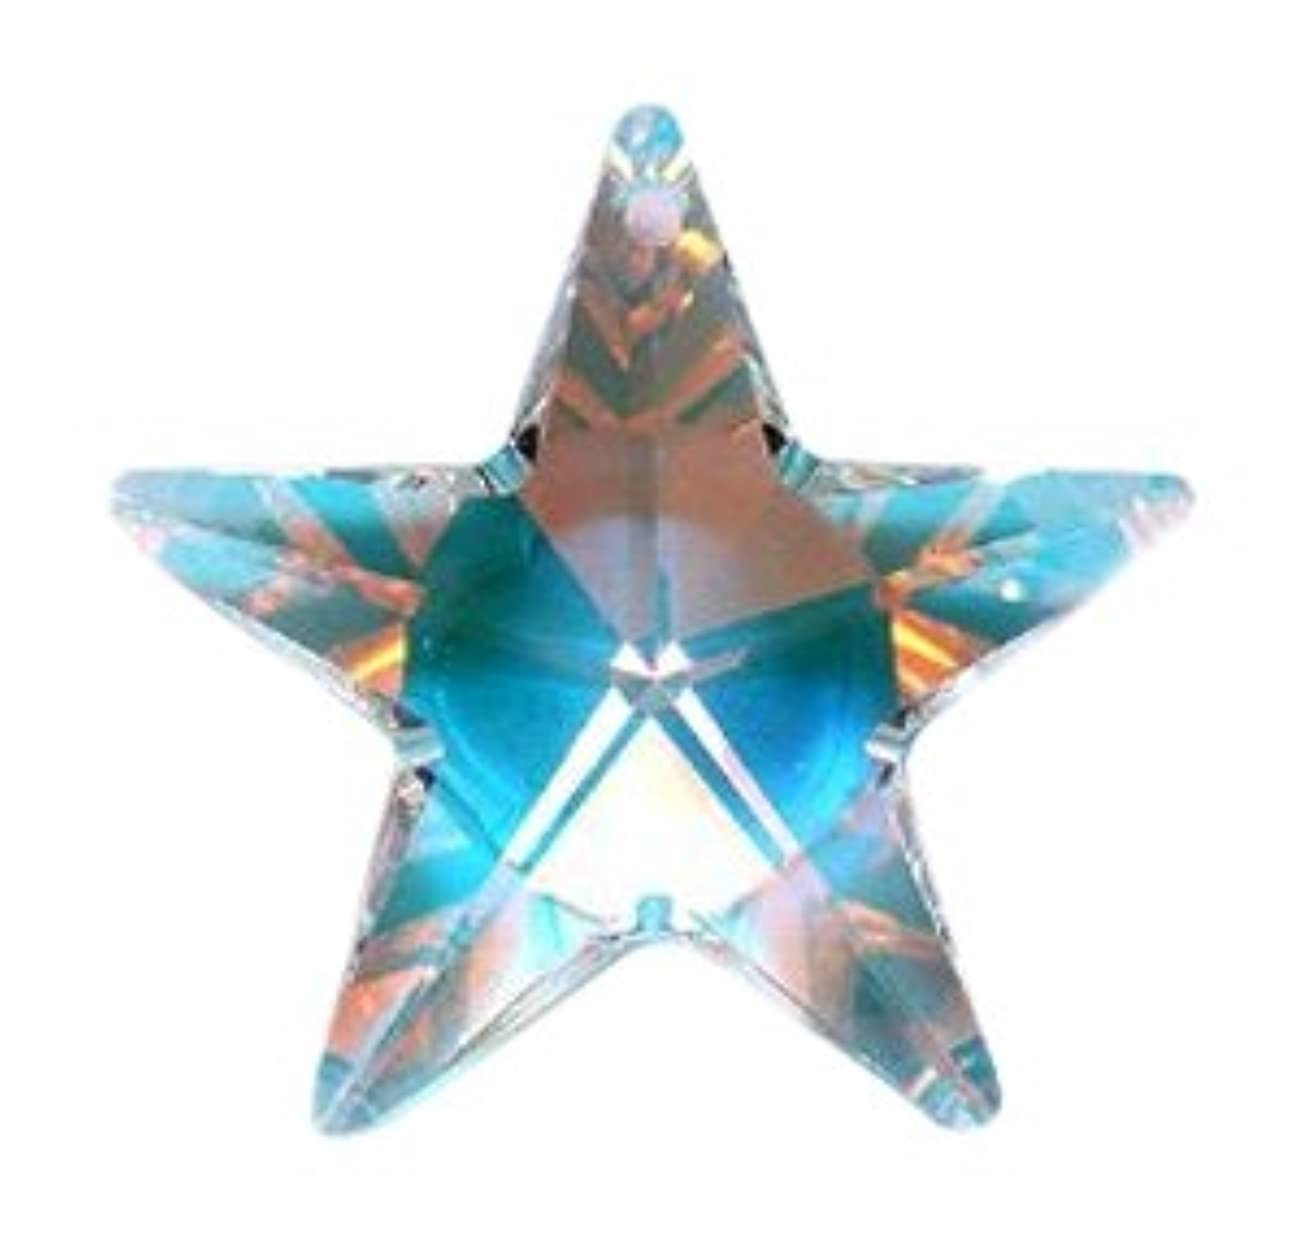 Swarovski 6714 Star Pendants, Aurora Borealis, Crystal, 28mm